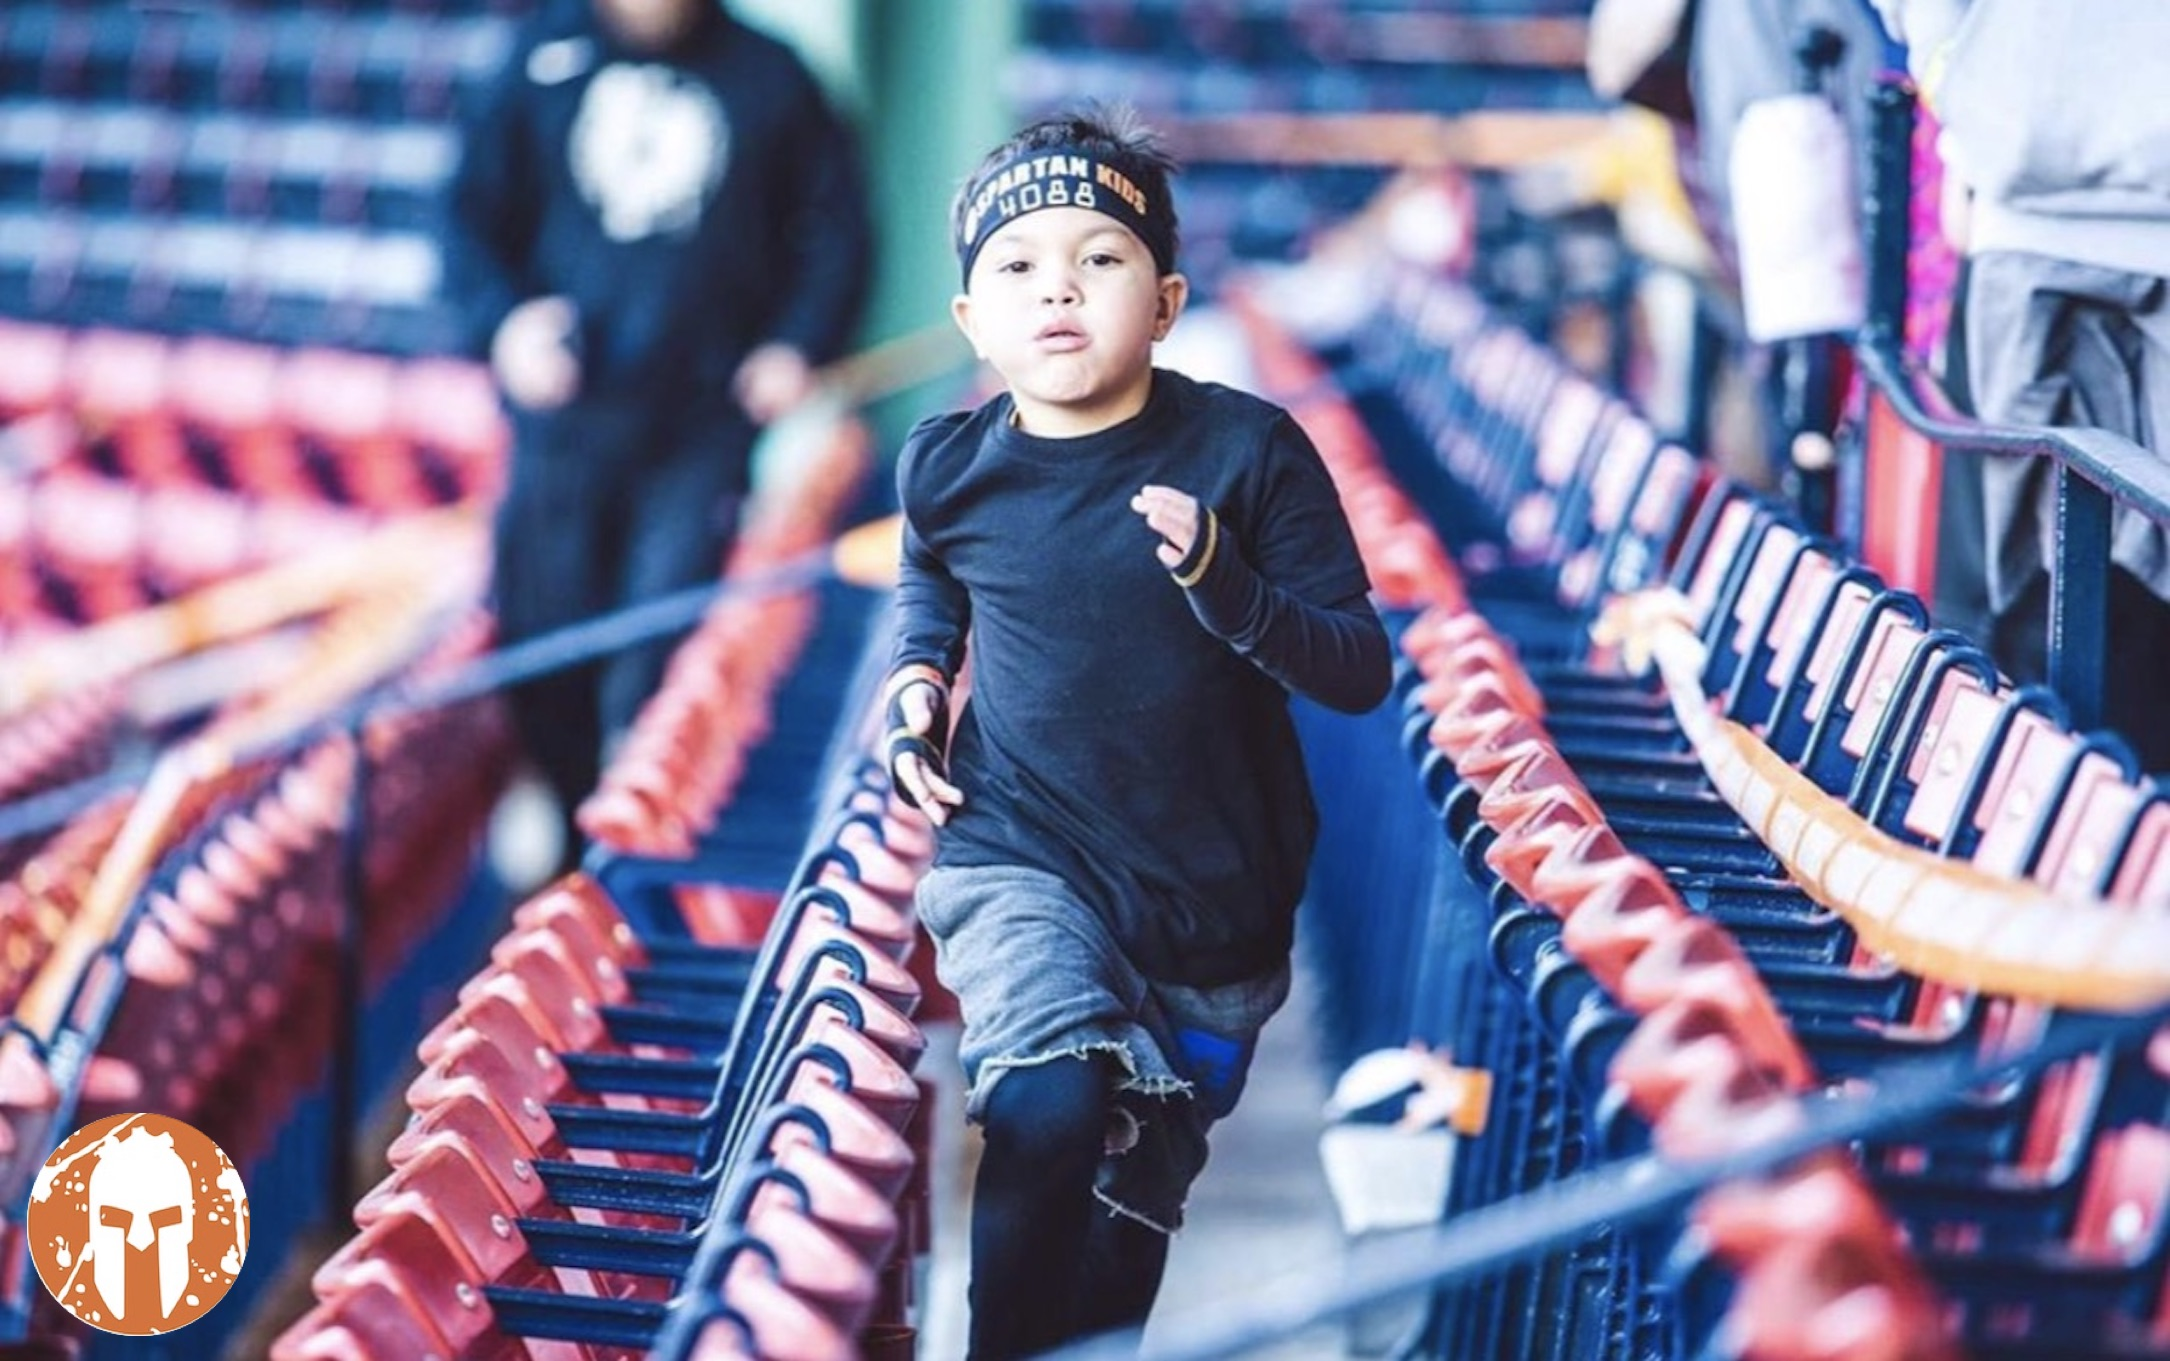 Fenway Park Stadion Kids Race - November 14th & 15th 2020